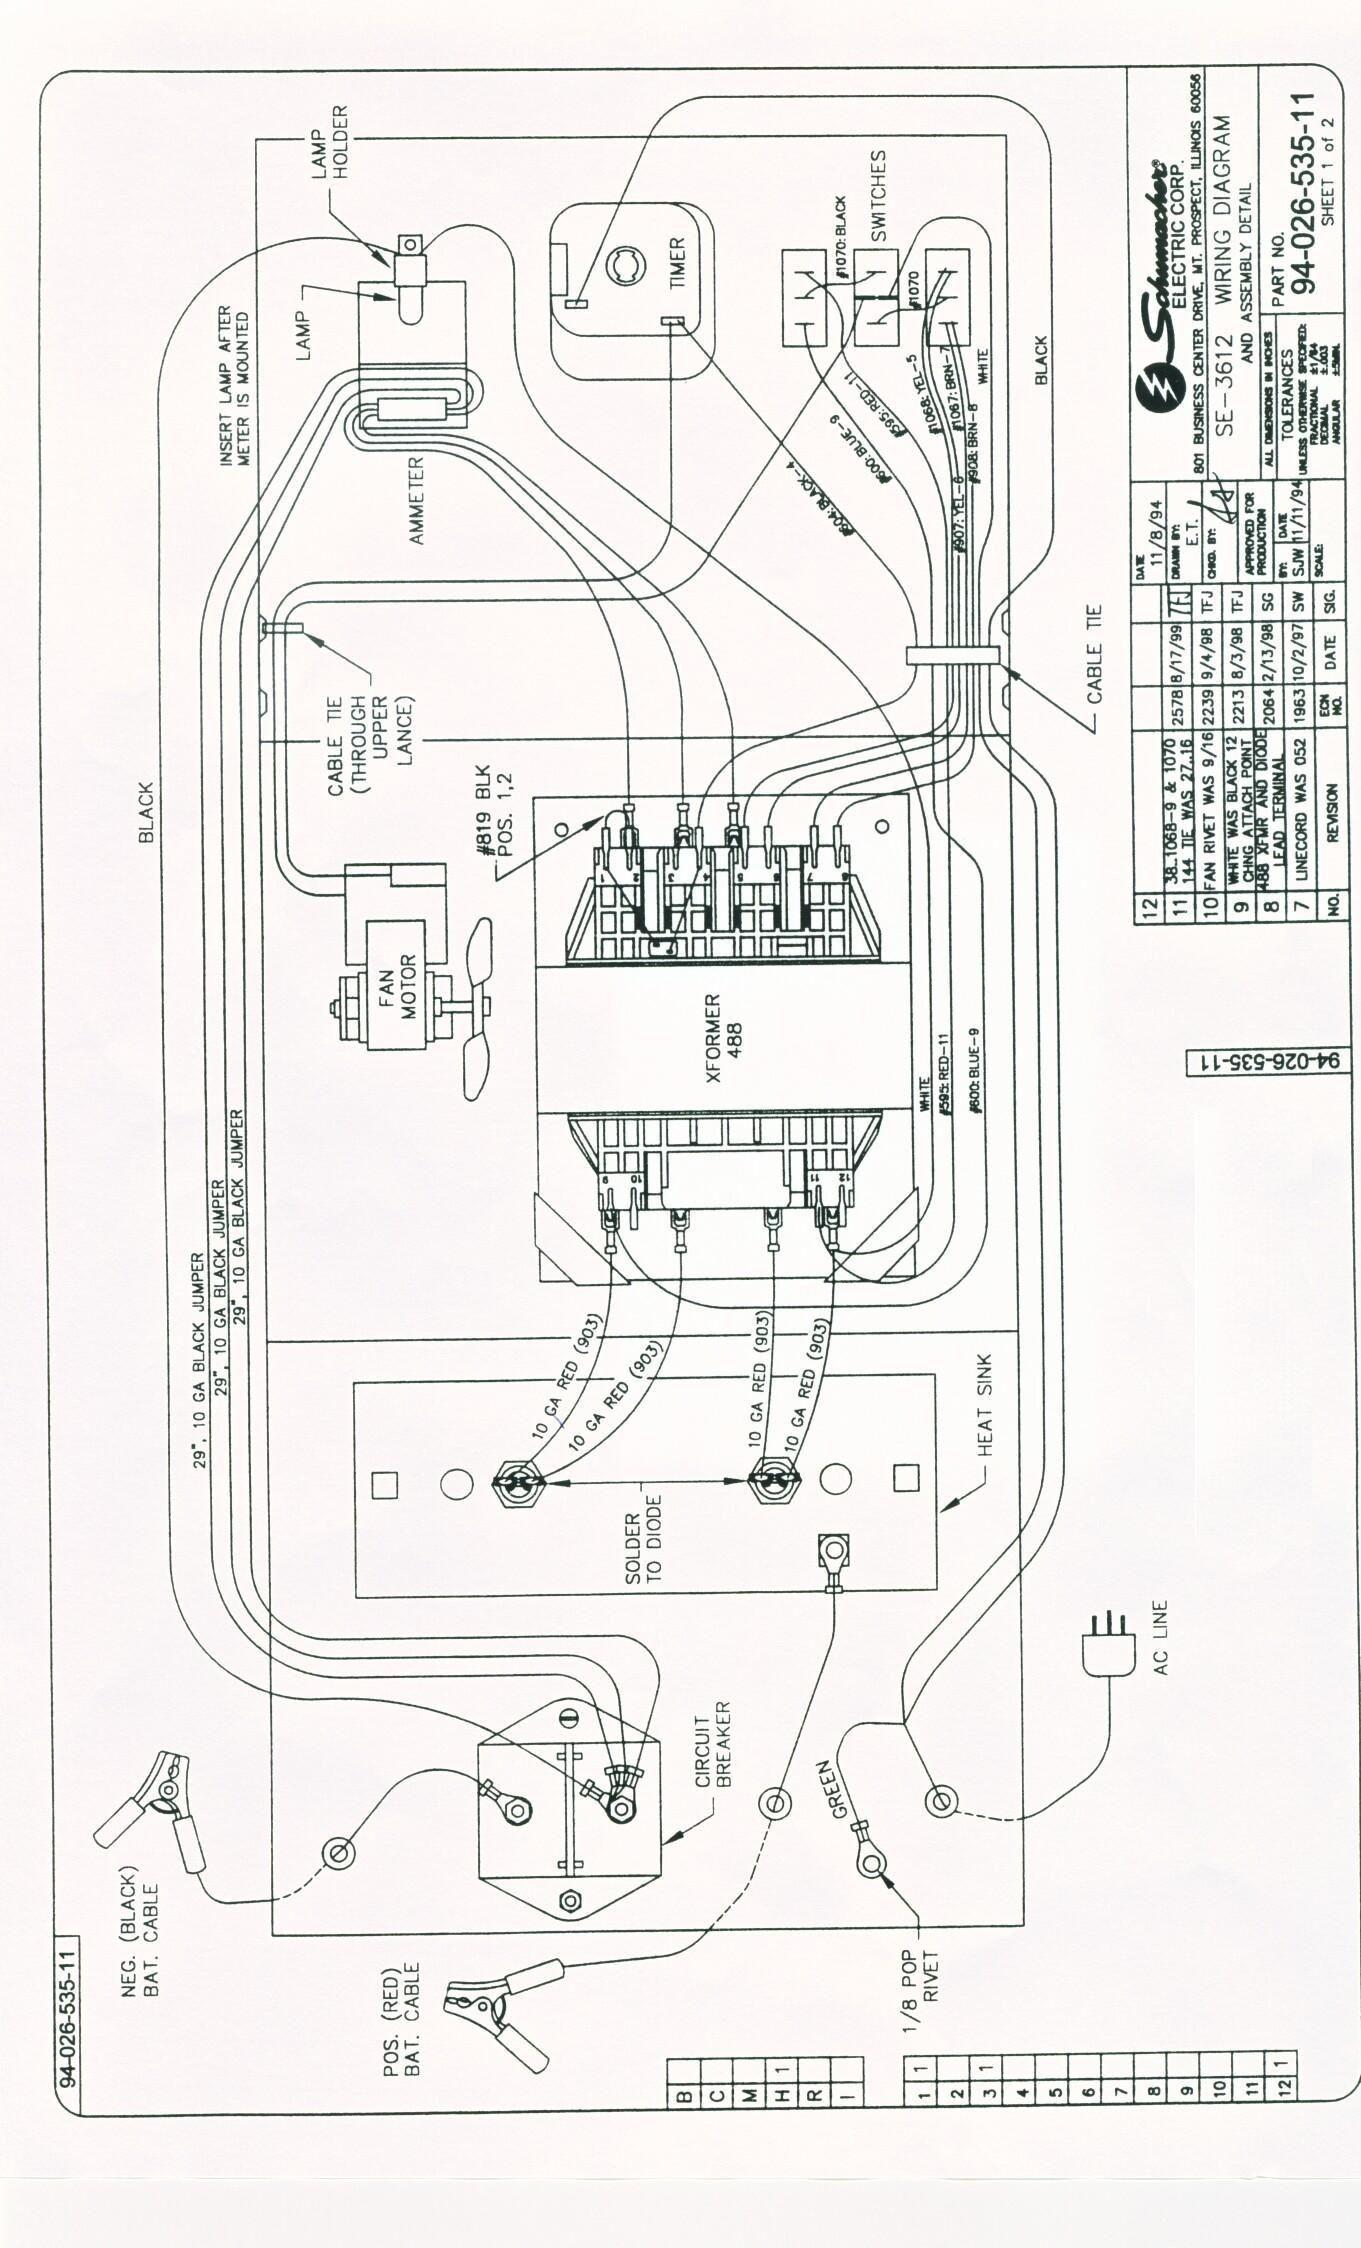 Elegant Schumacher Battery Charger Wiring Diagram in 2020